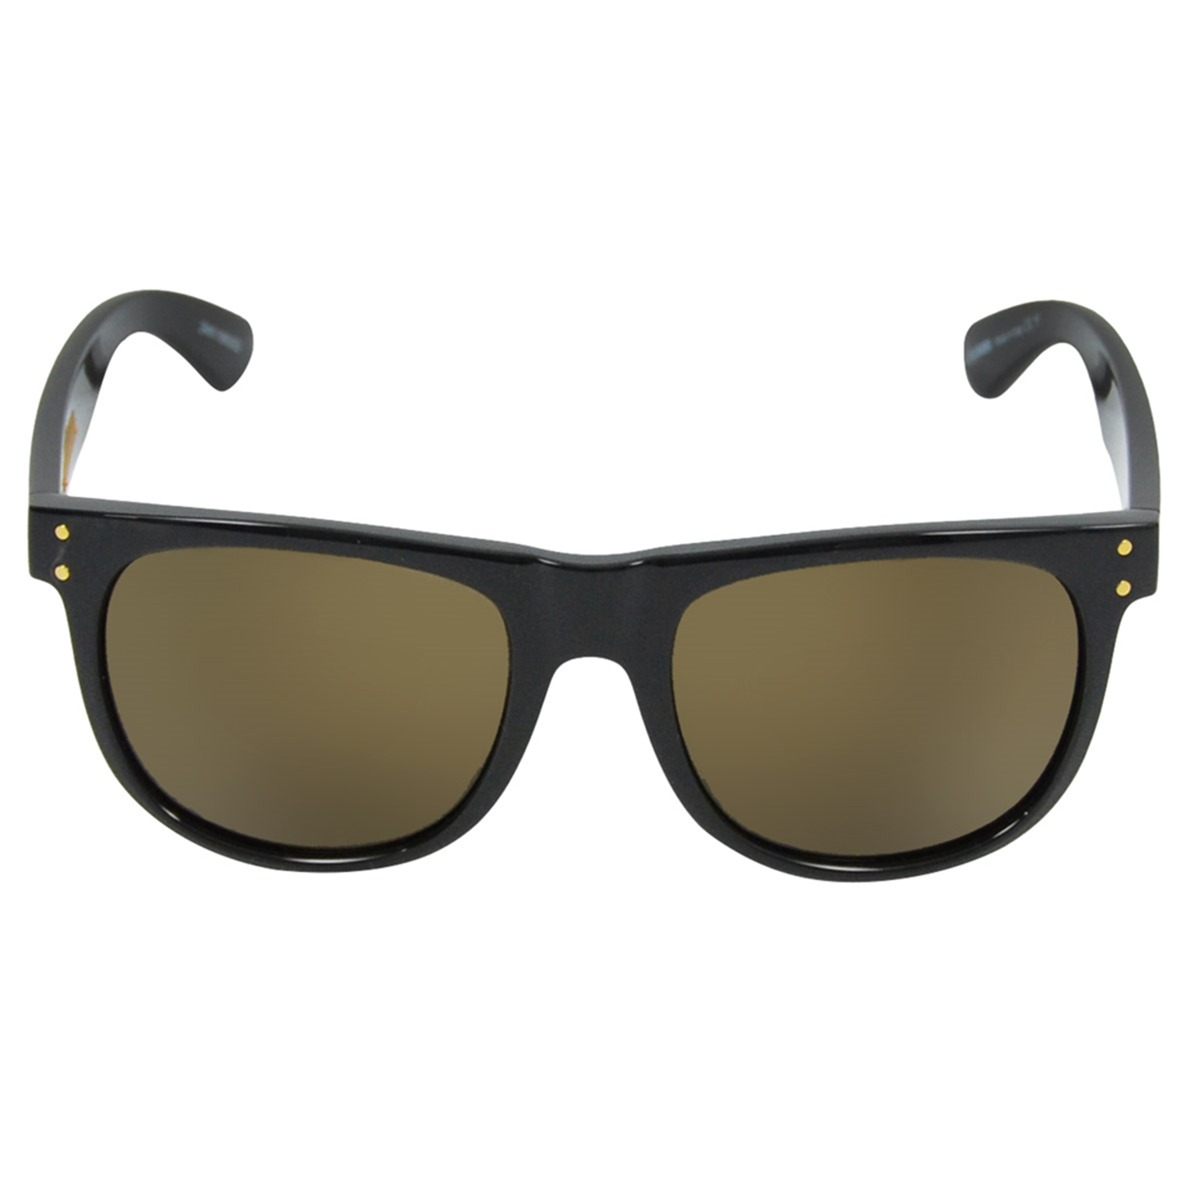 33dfb3007925b Óculos Evoke On The Rocks Black Shine Gold - R  596,70 em Mercado Livre